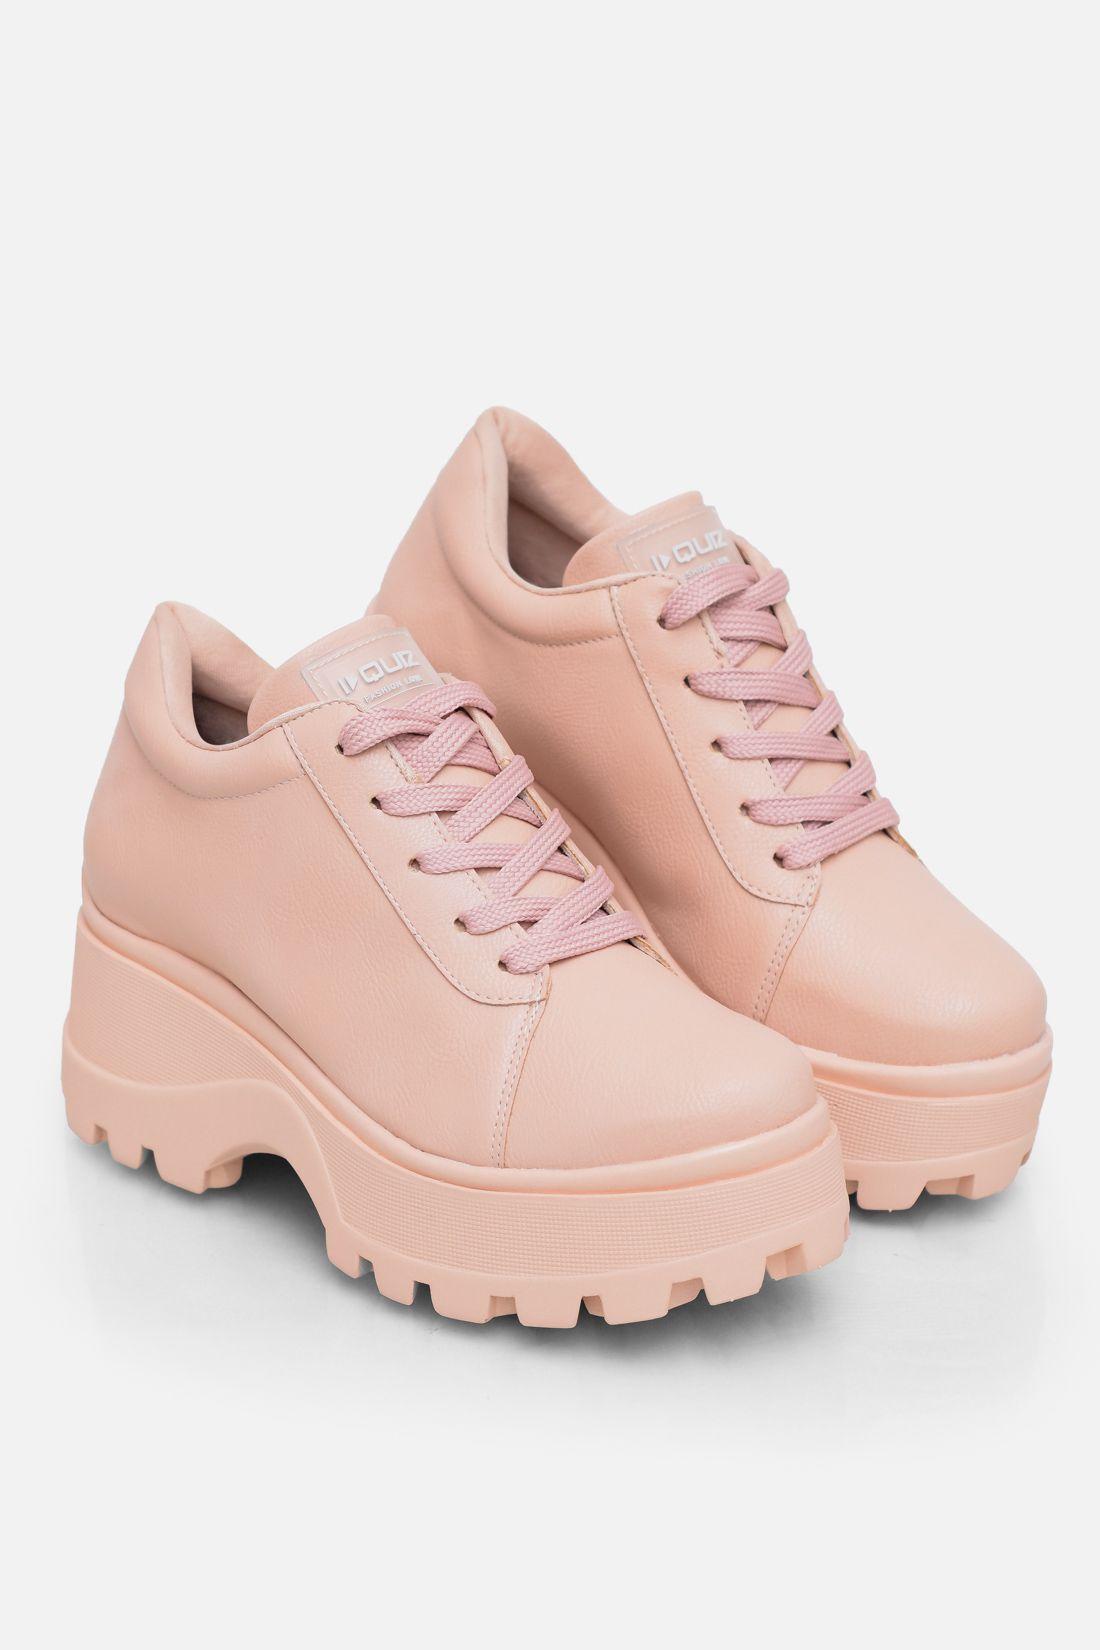 Tenis Ugly Sneaker Quiz Caprino